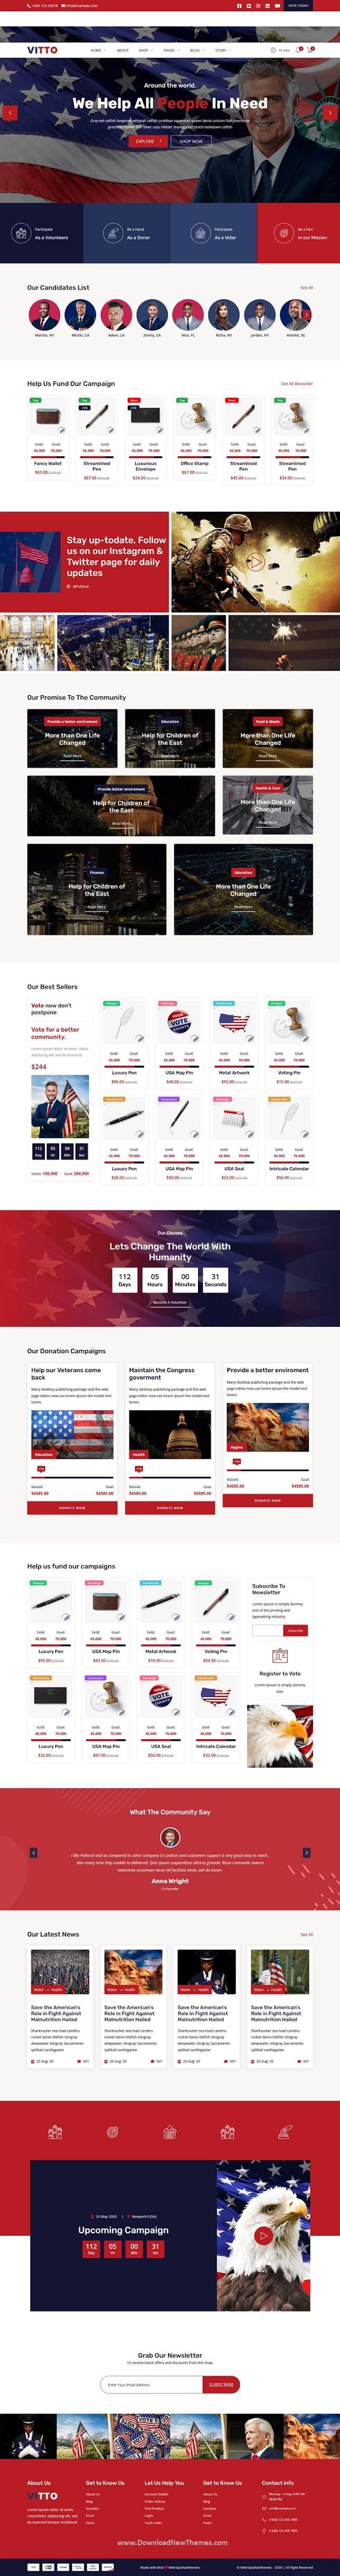 Political Campaign Website Template